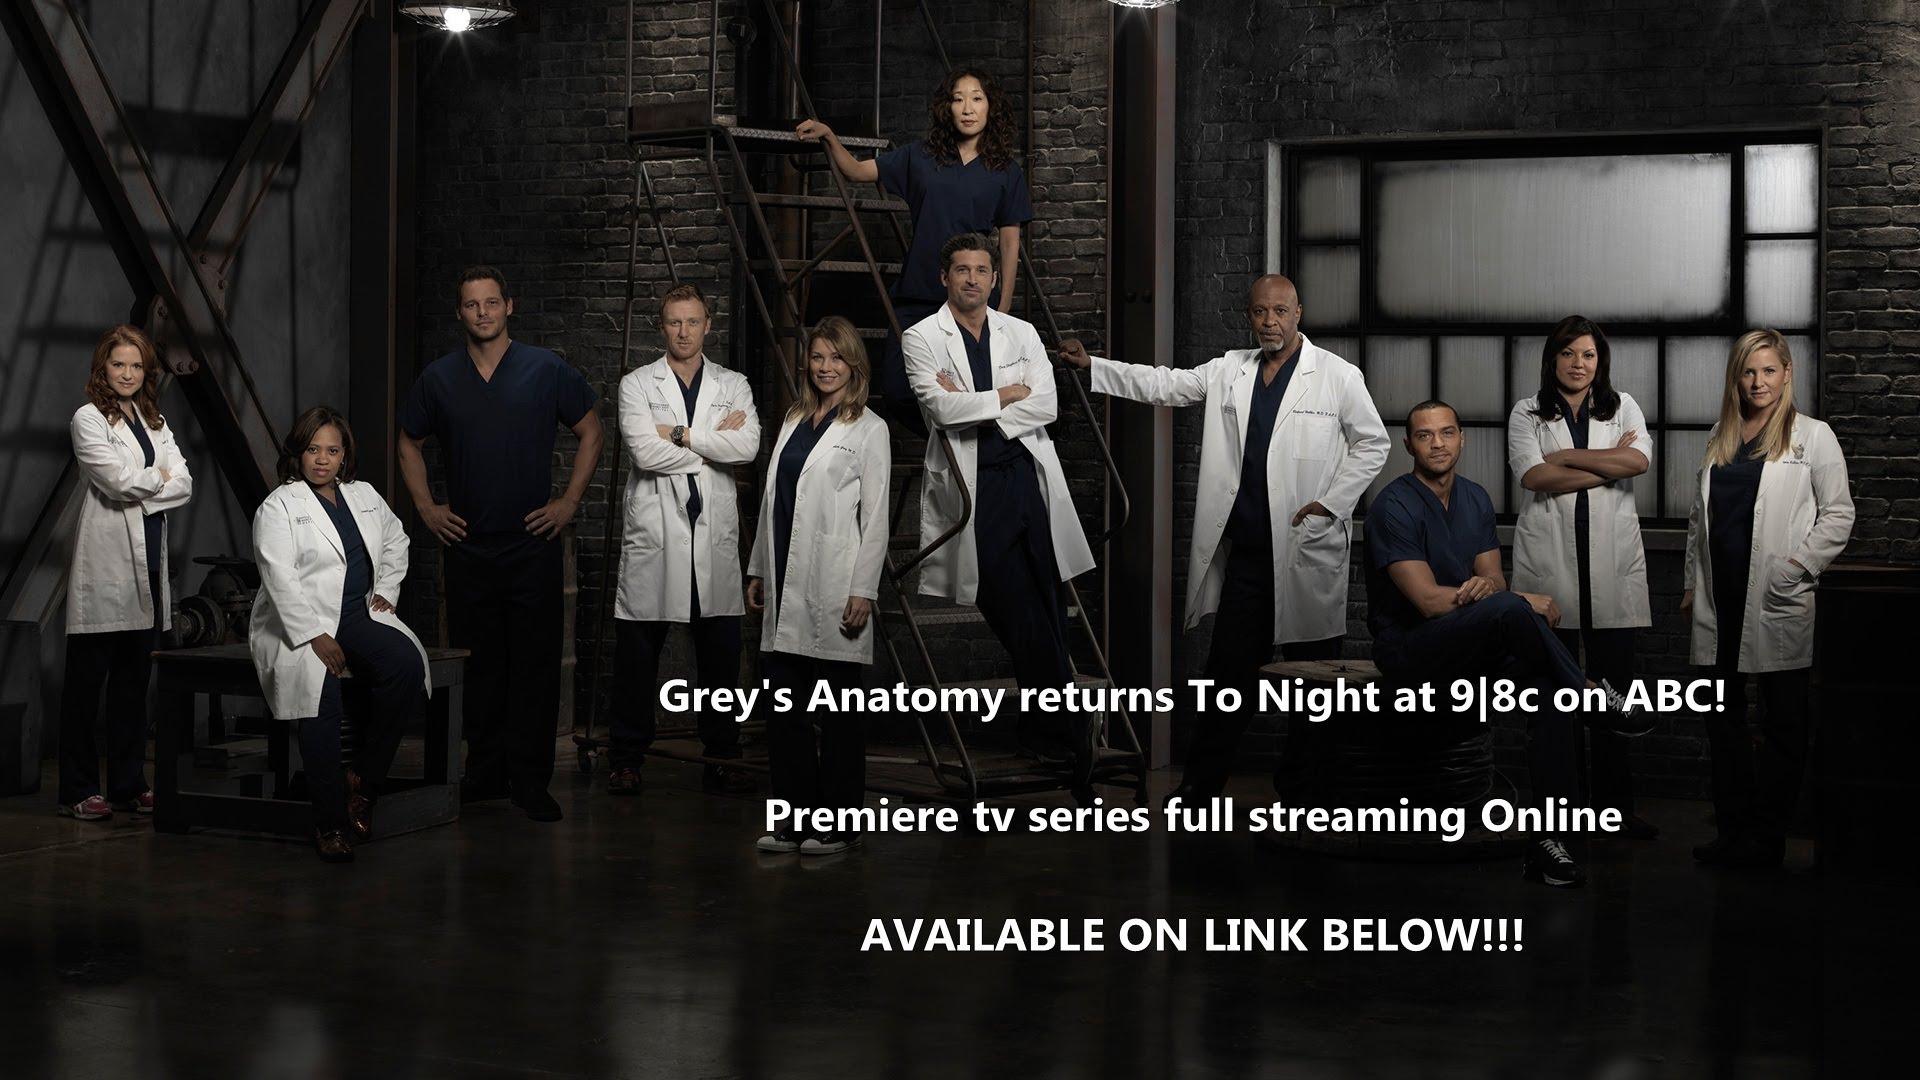 Greys Anatomy 12x11 Unbreak My Heart Season 12 Episode 11 Full